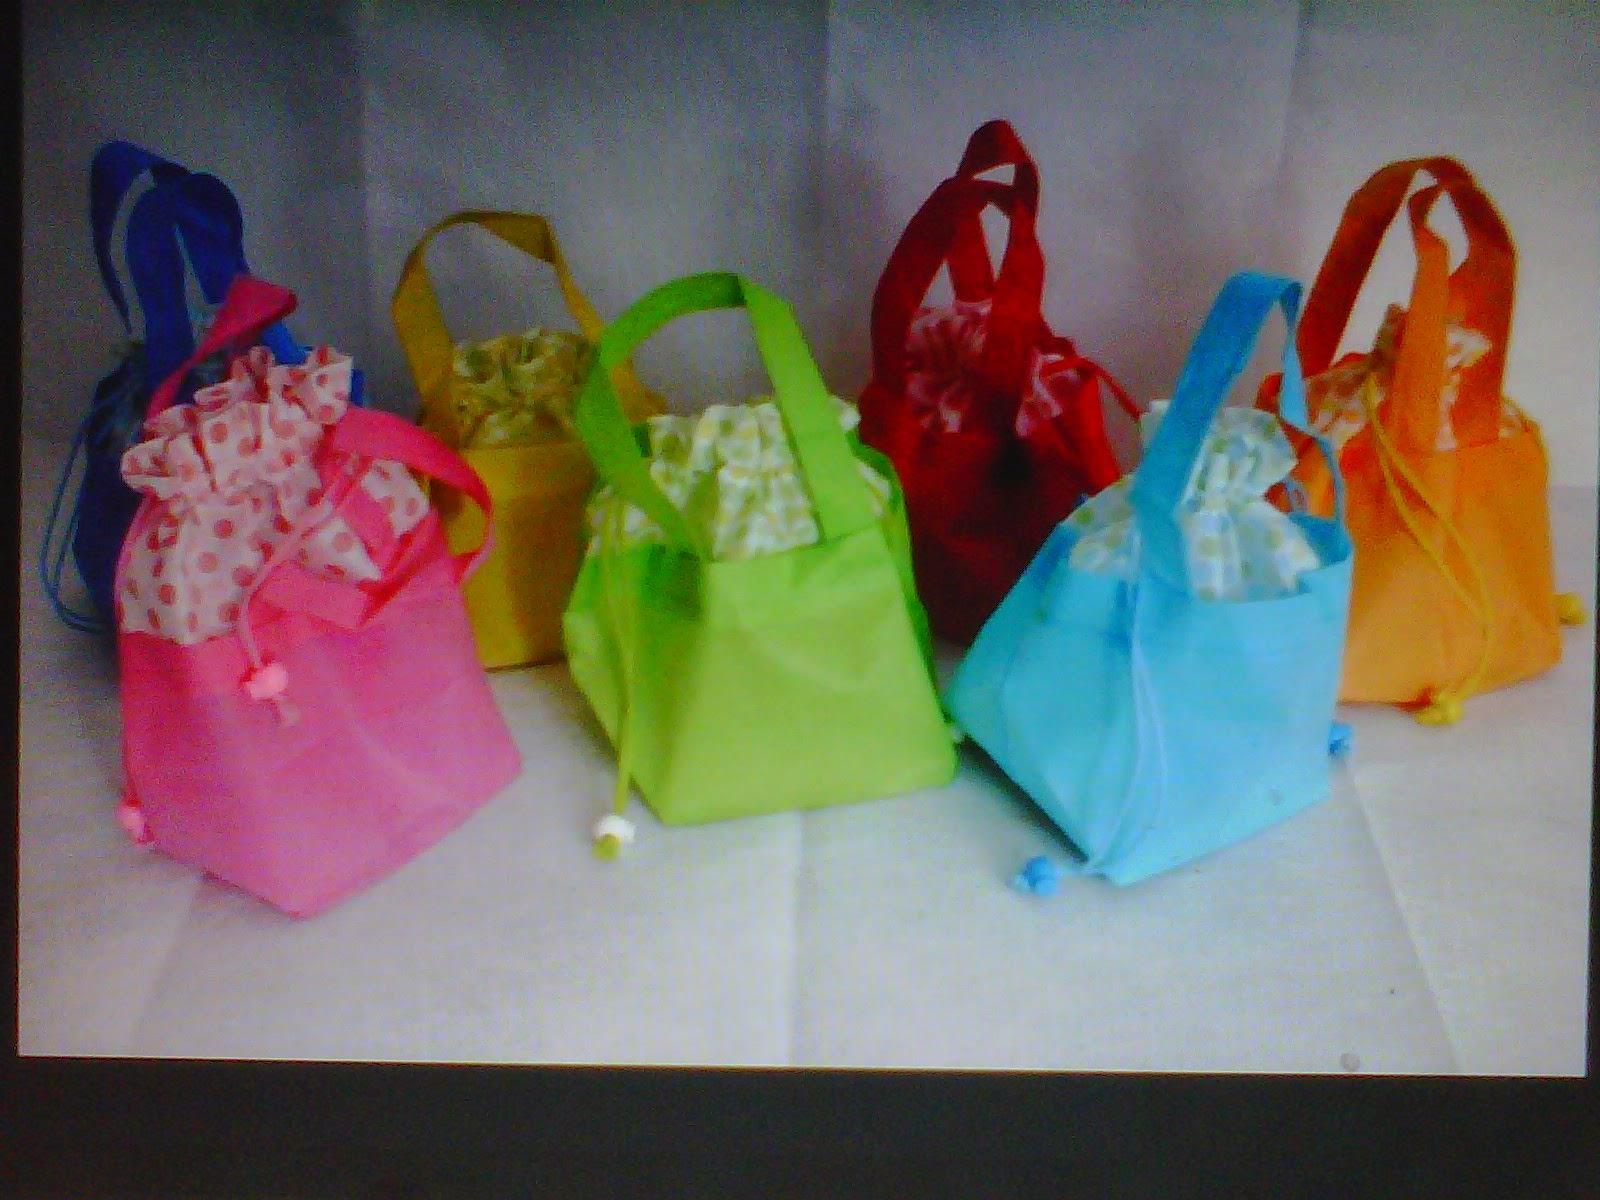 http://souvenirpernikahantop.blogspot.com/2013/04/souvenir-pernikahan-terbaru-taplak-meja.html